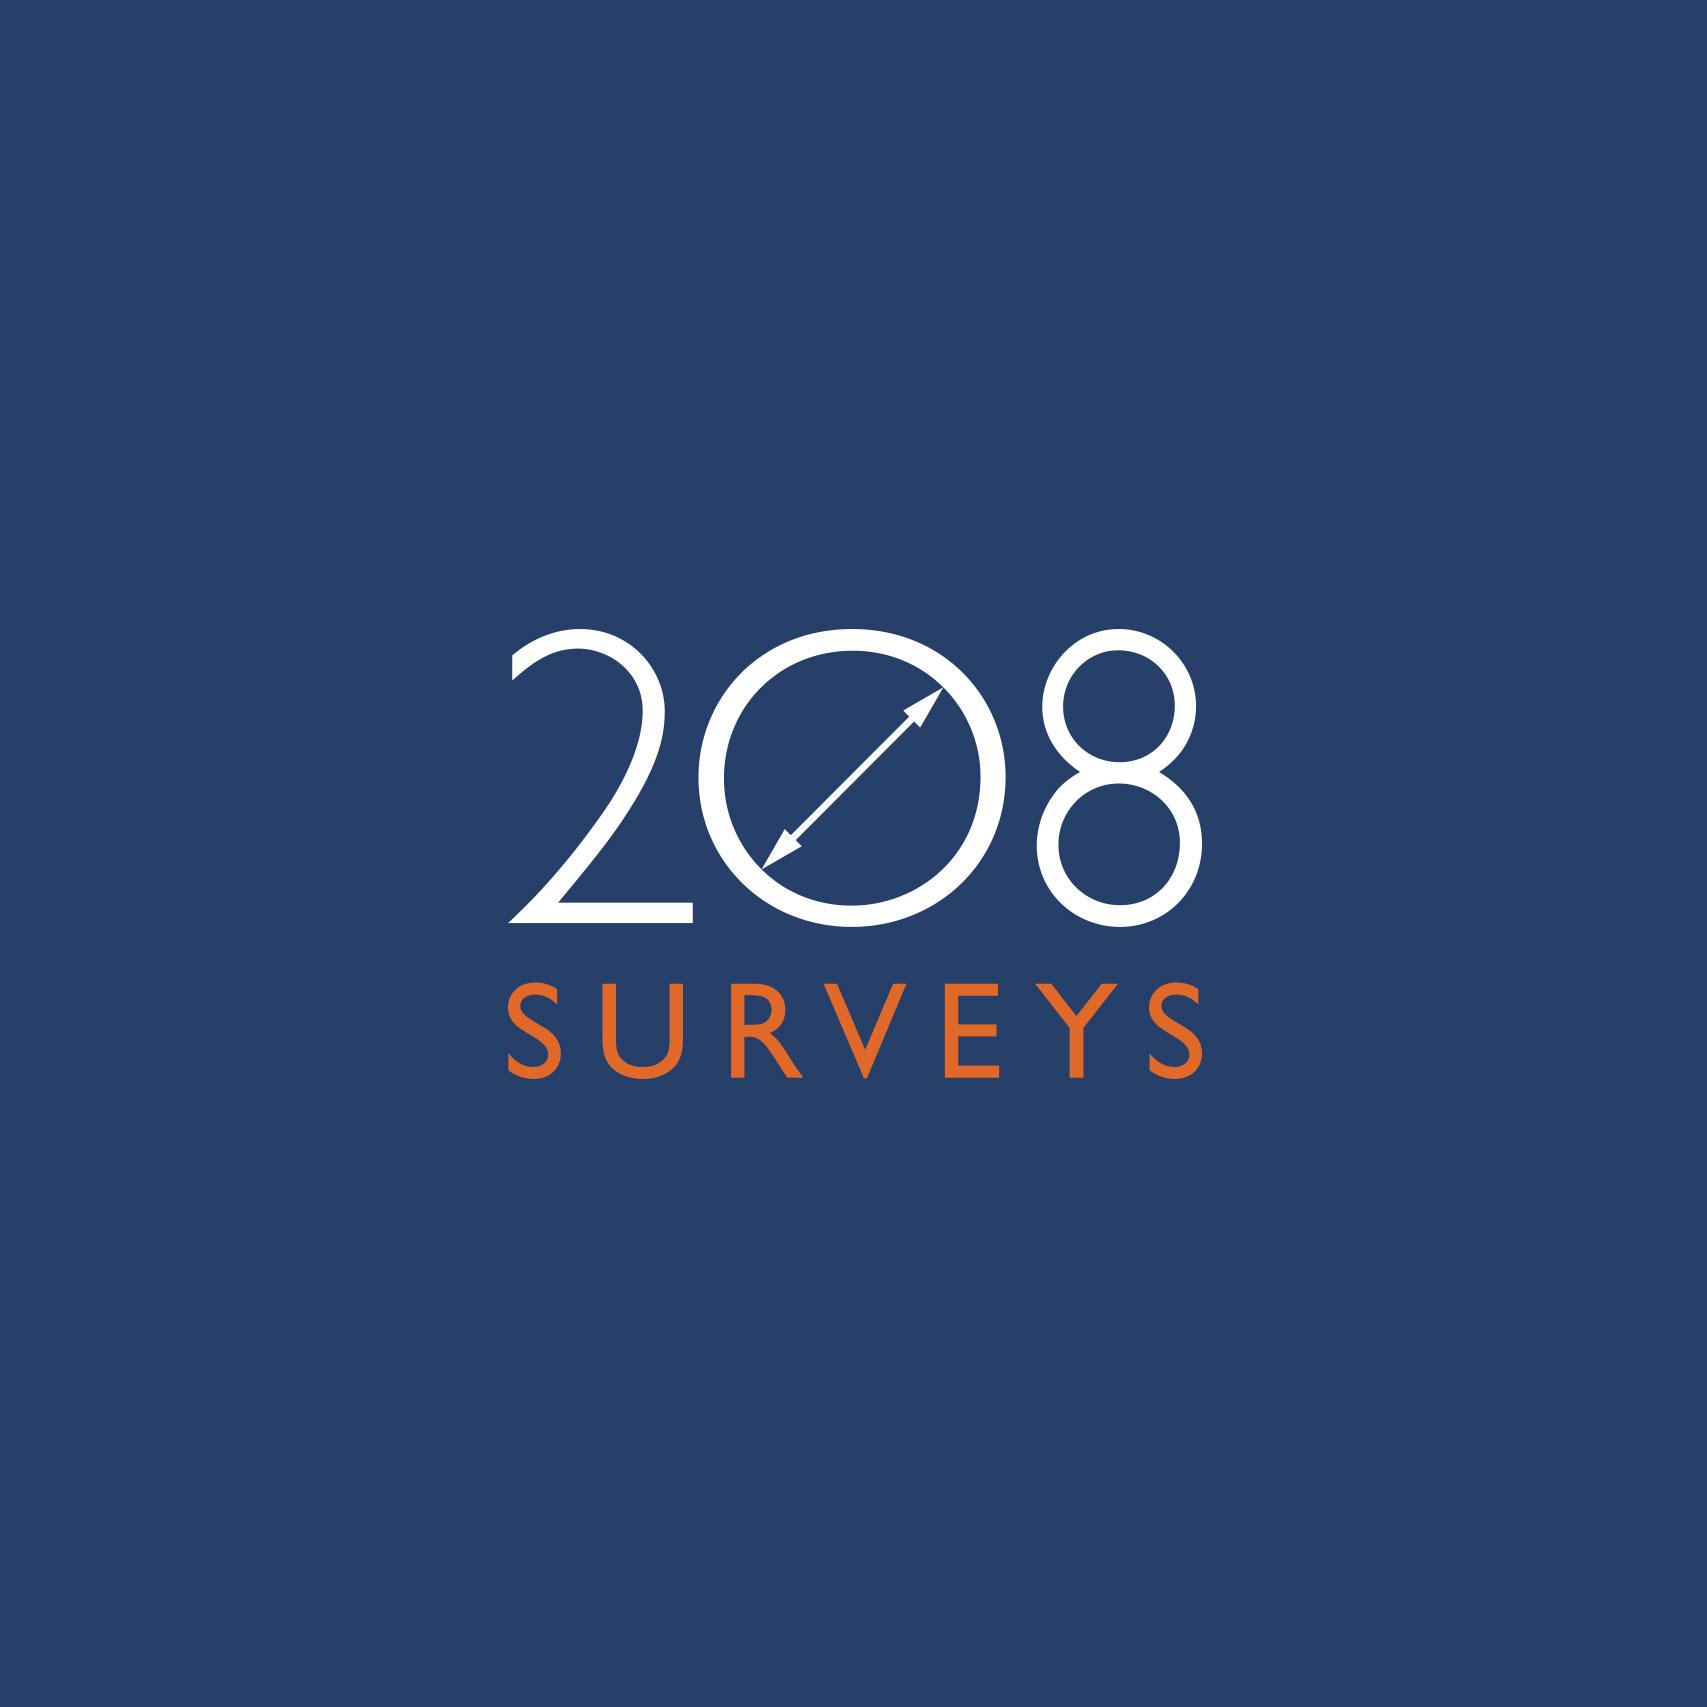 Simple and modern logo design for 208 Surveys London.